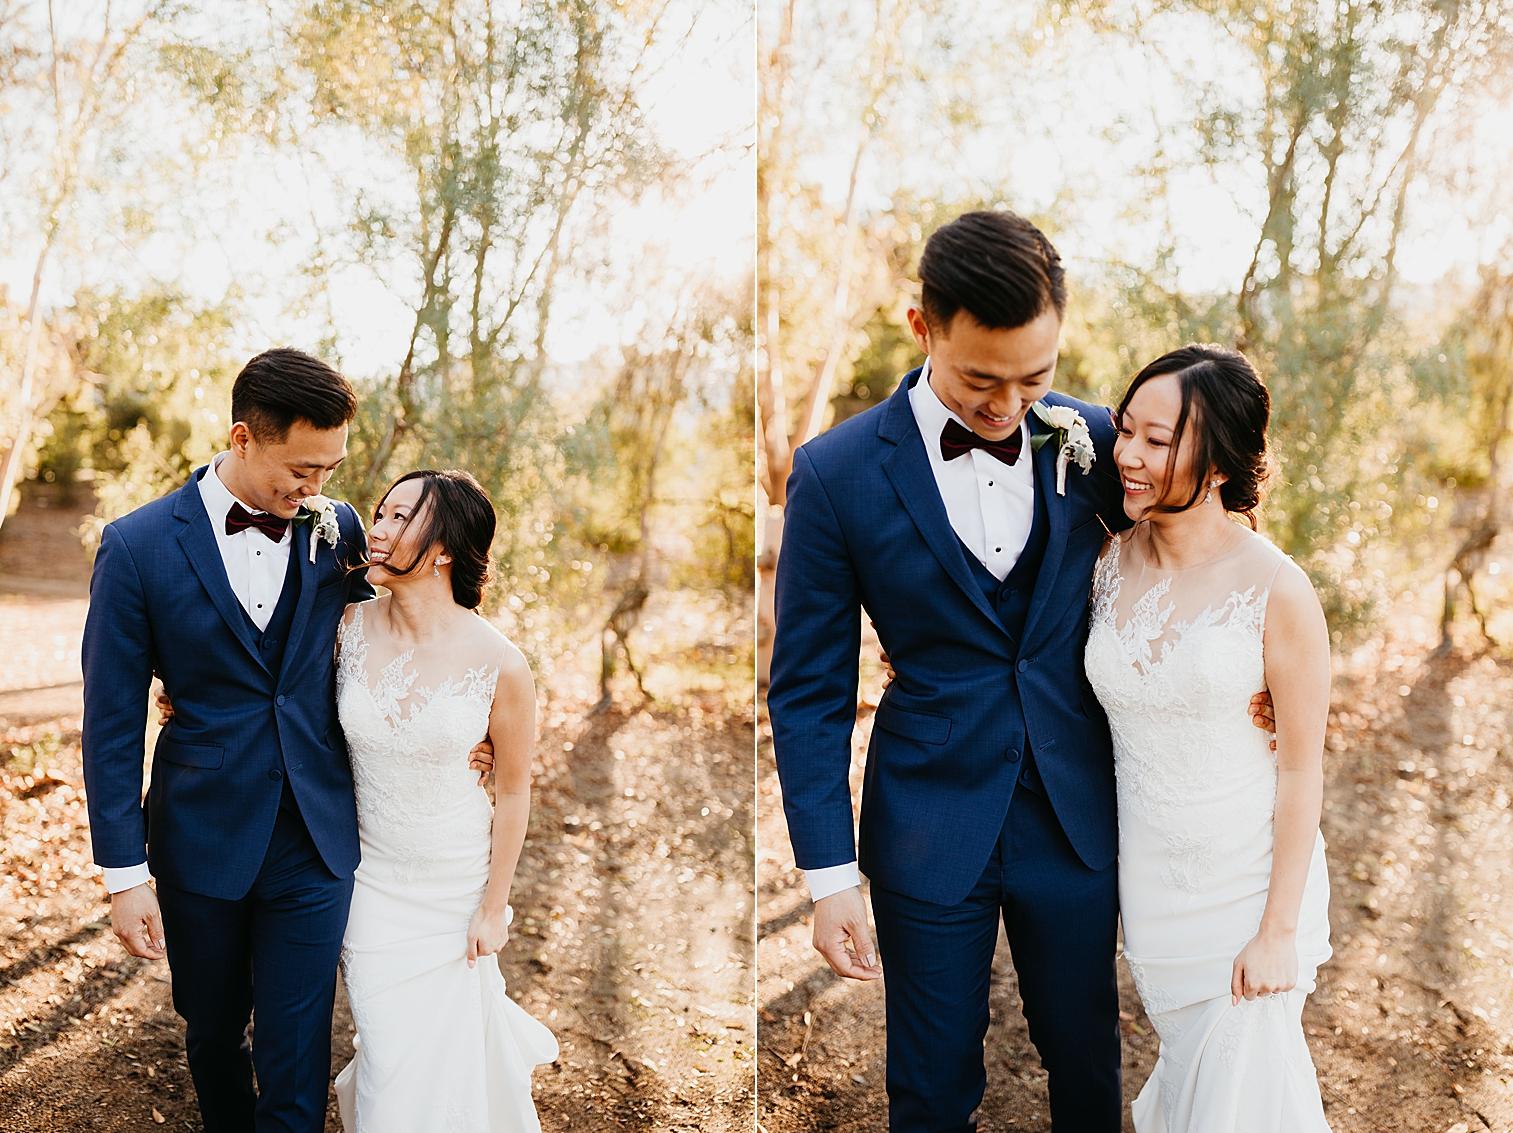 Secret-Garden-Rancho-Santa-Fe-Wedding-99.jpg